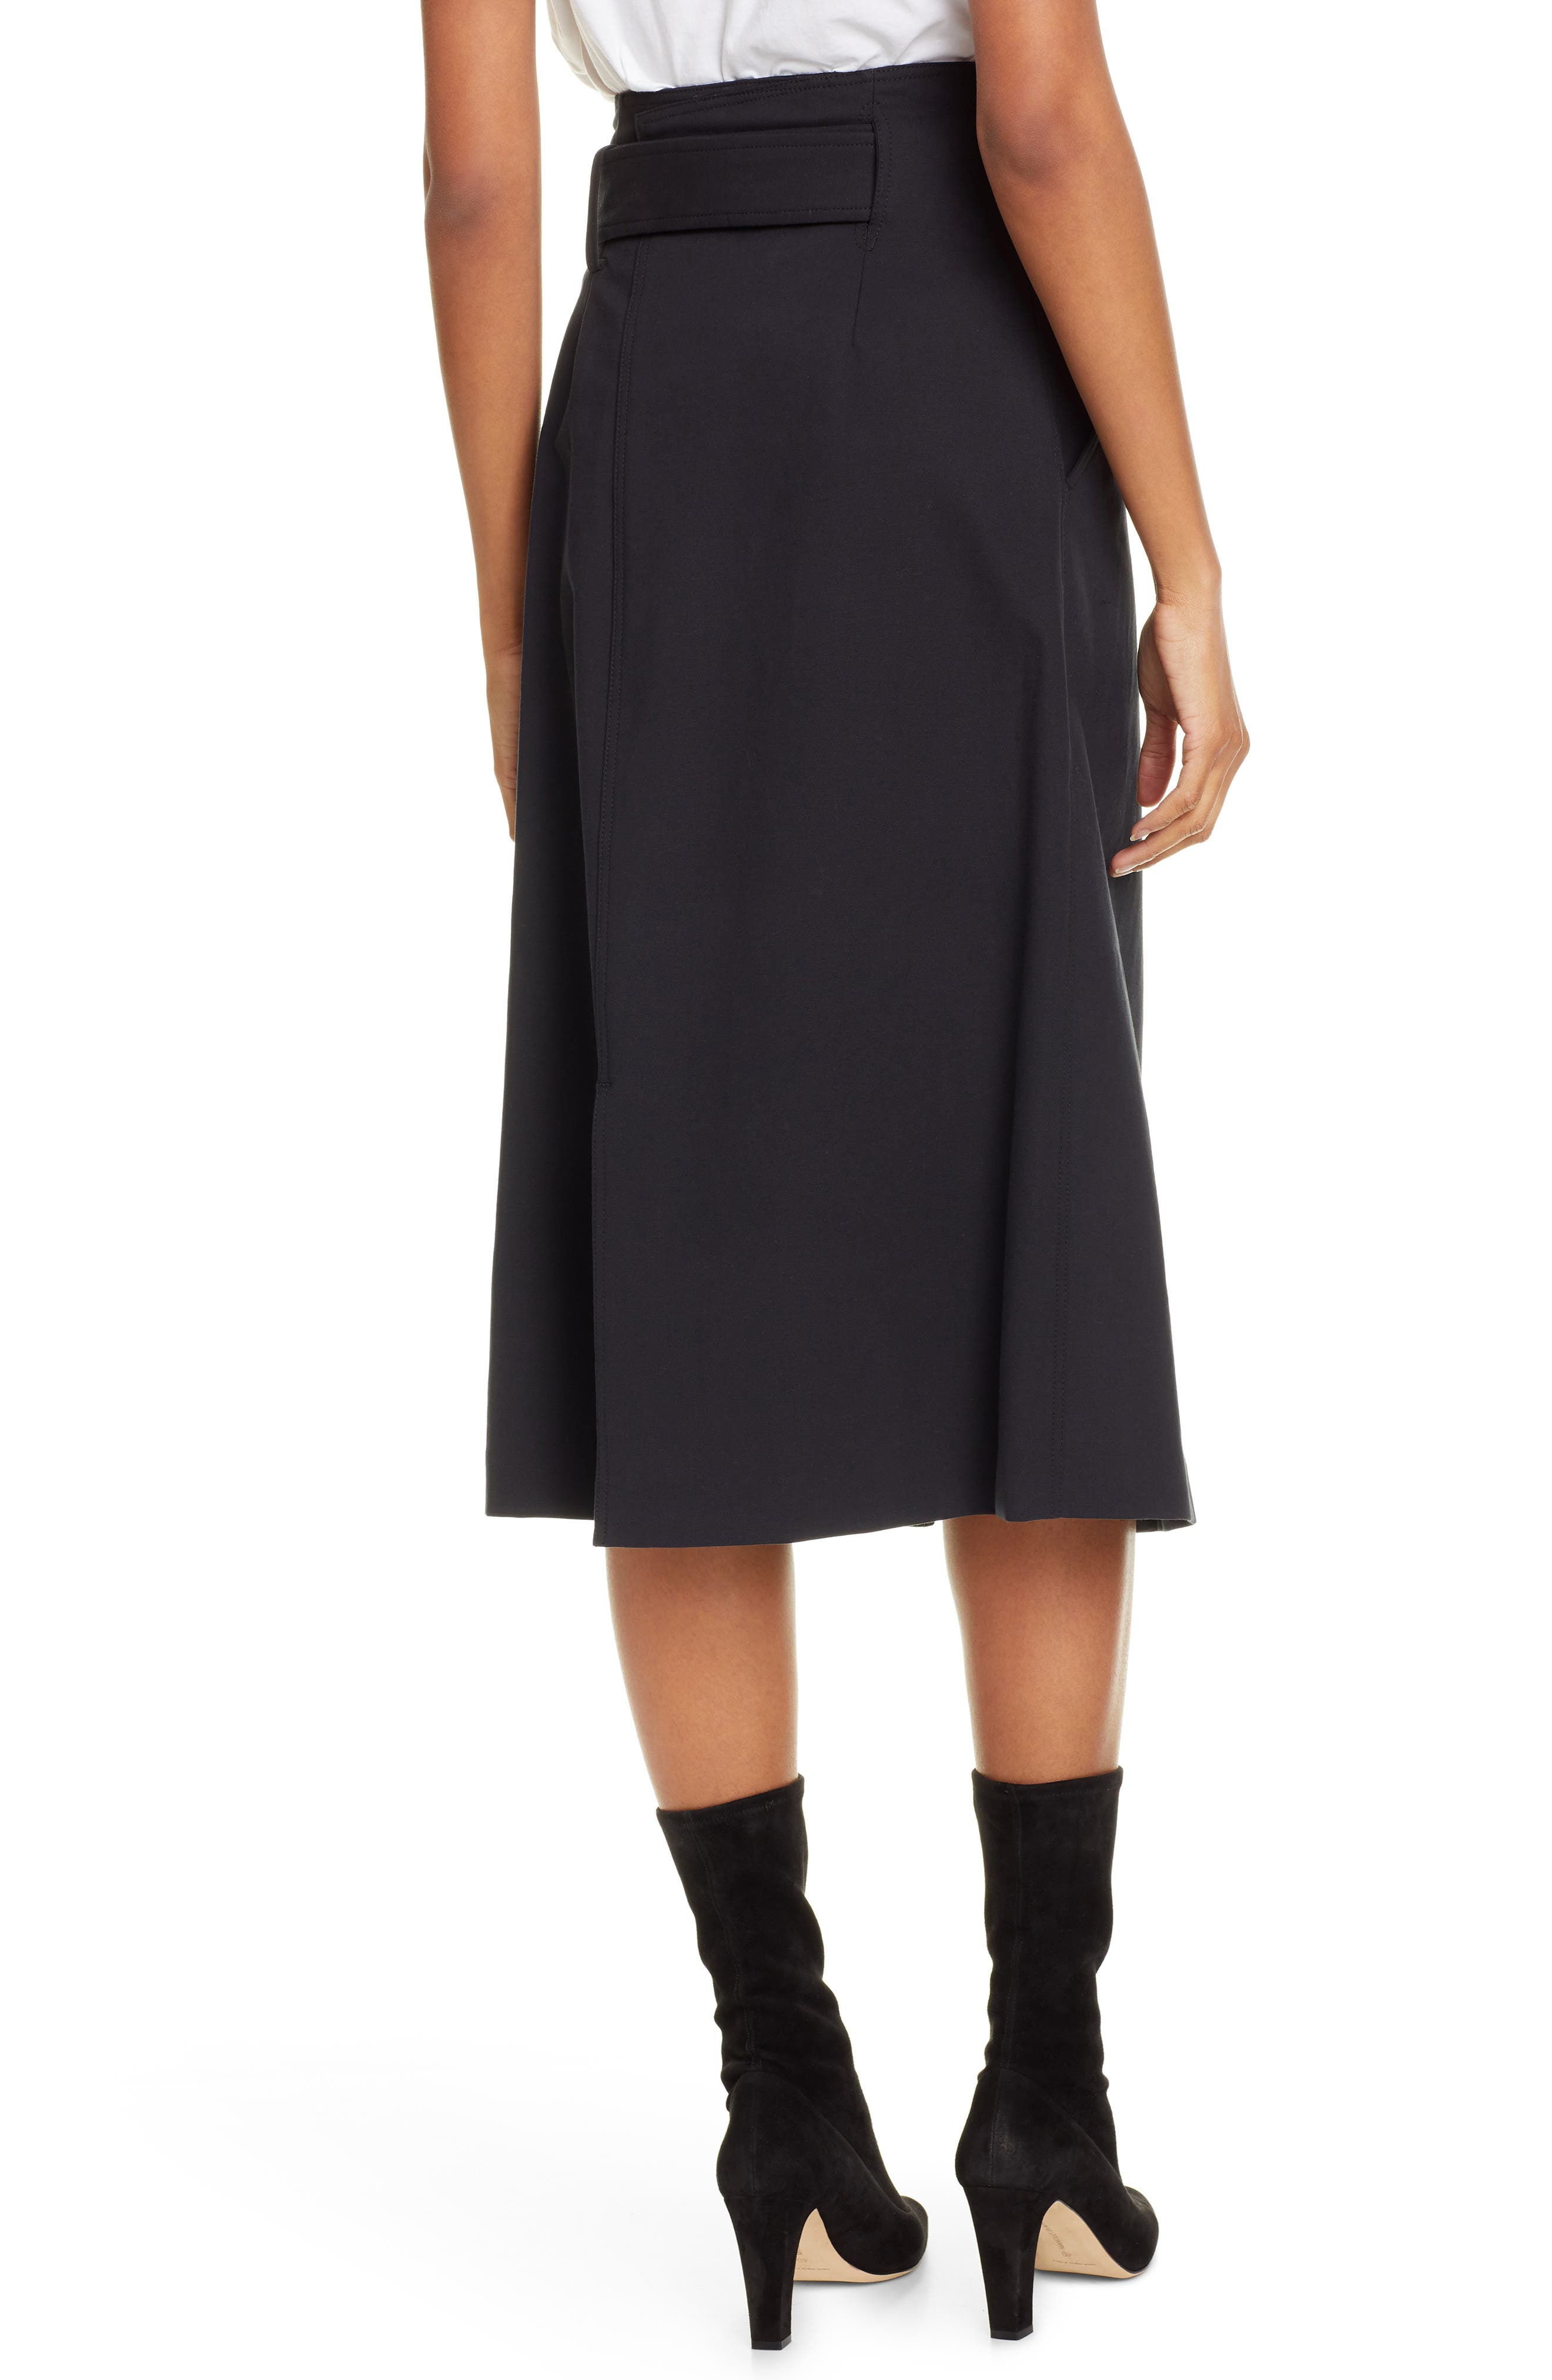 A.L.C., Aldridge Belted Midi Skirt, Alternate thumbnail 2, color, VINTAGE BLACK